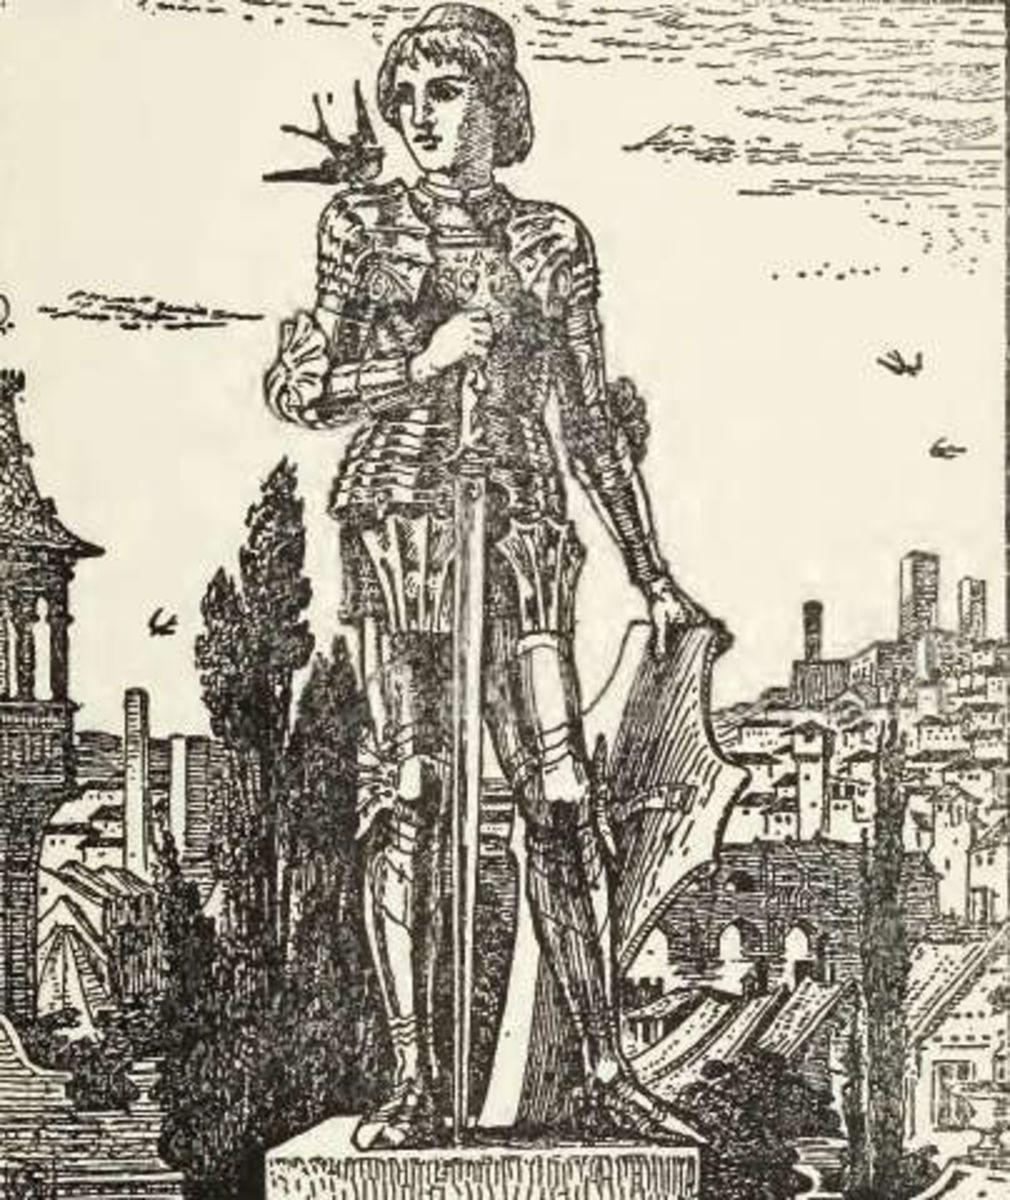 Illustration: Walter Crane